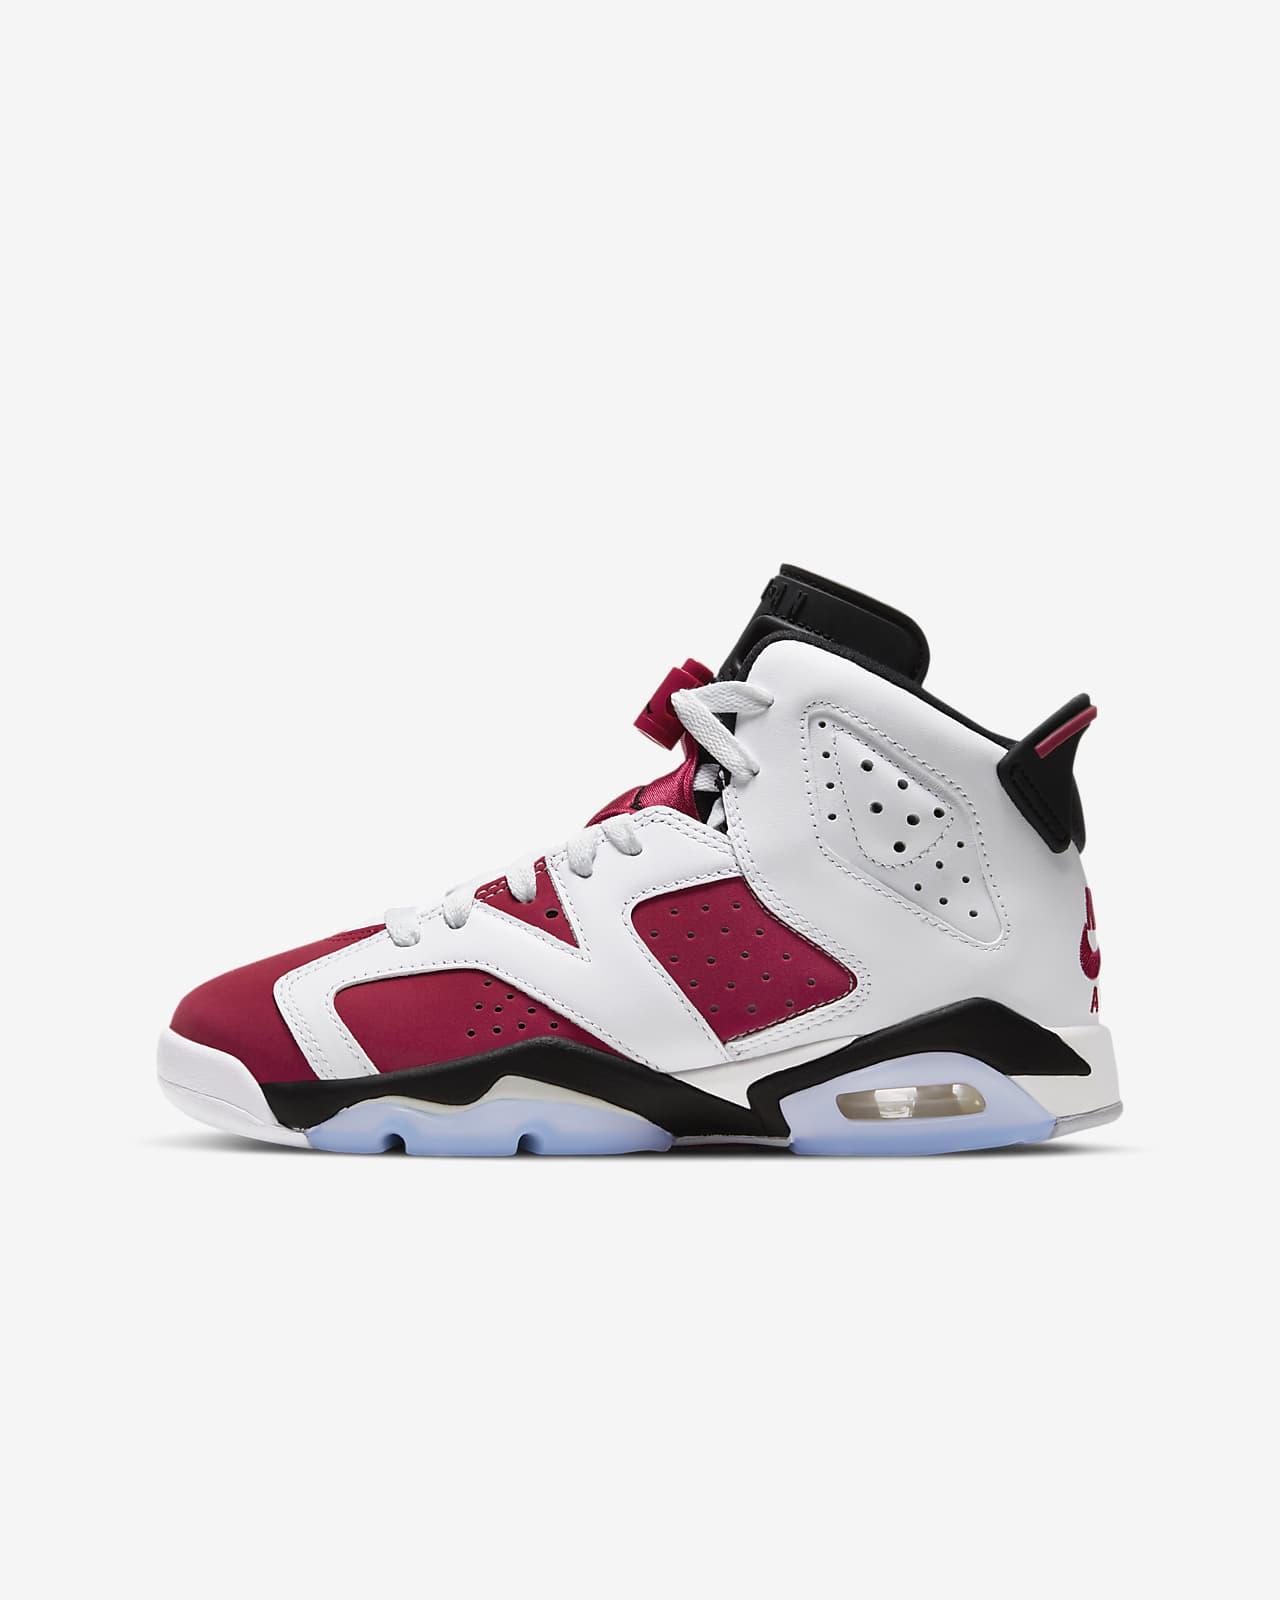 Air Jordan 6 Retro Schuh für ältere Kinder